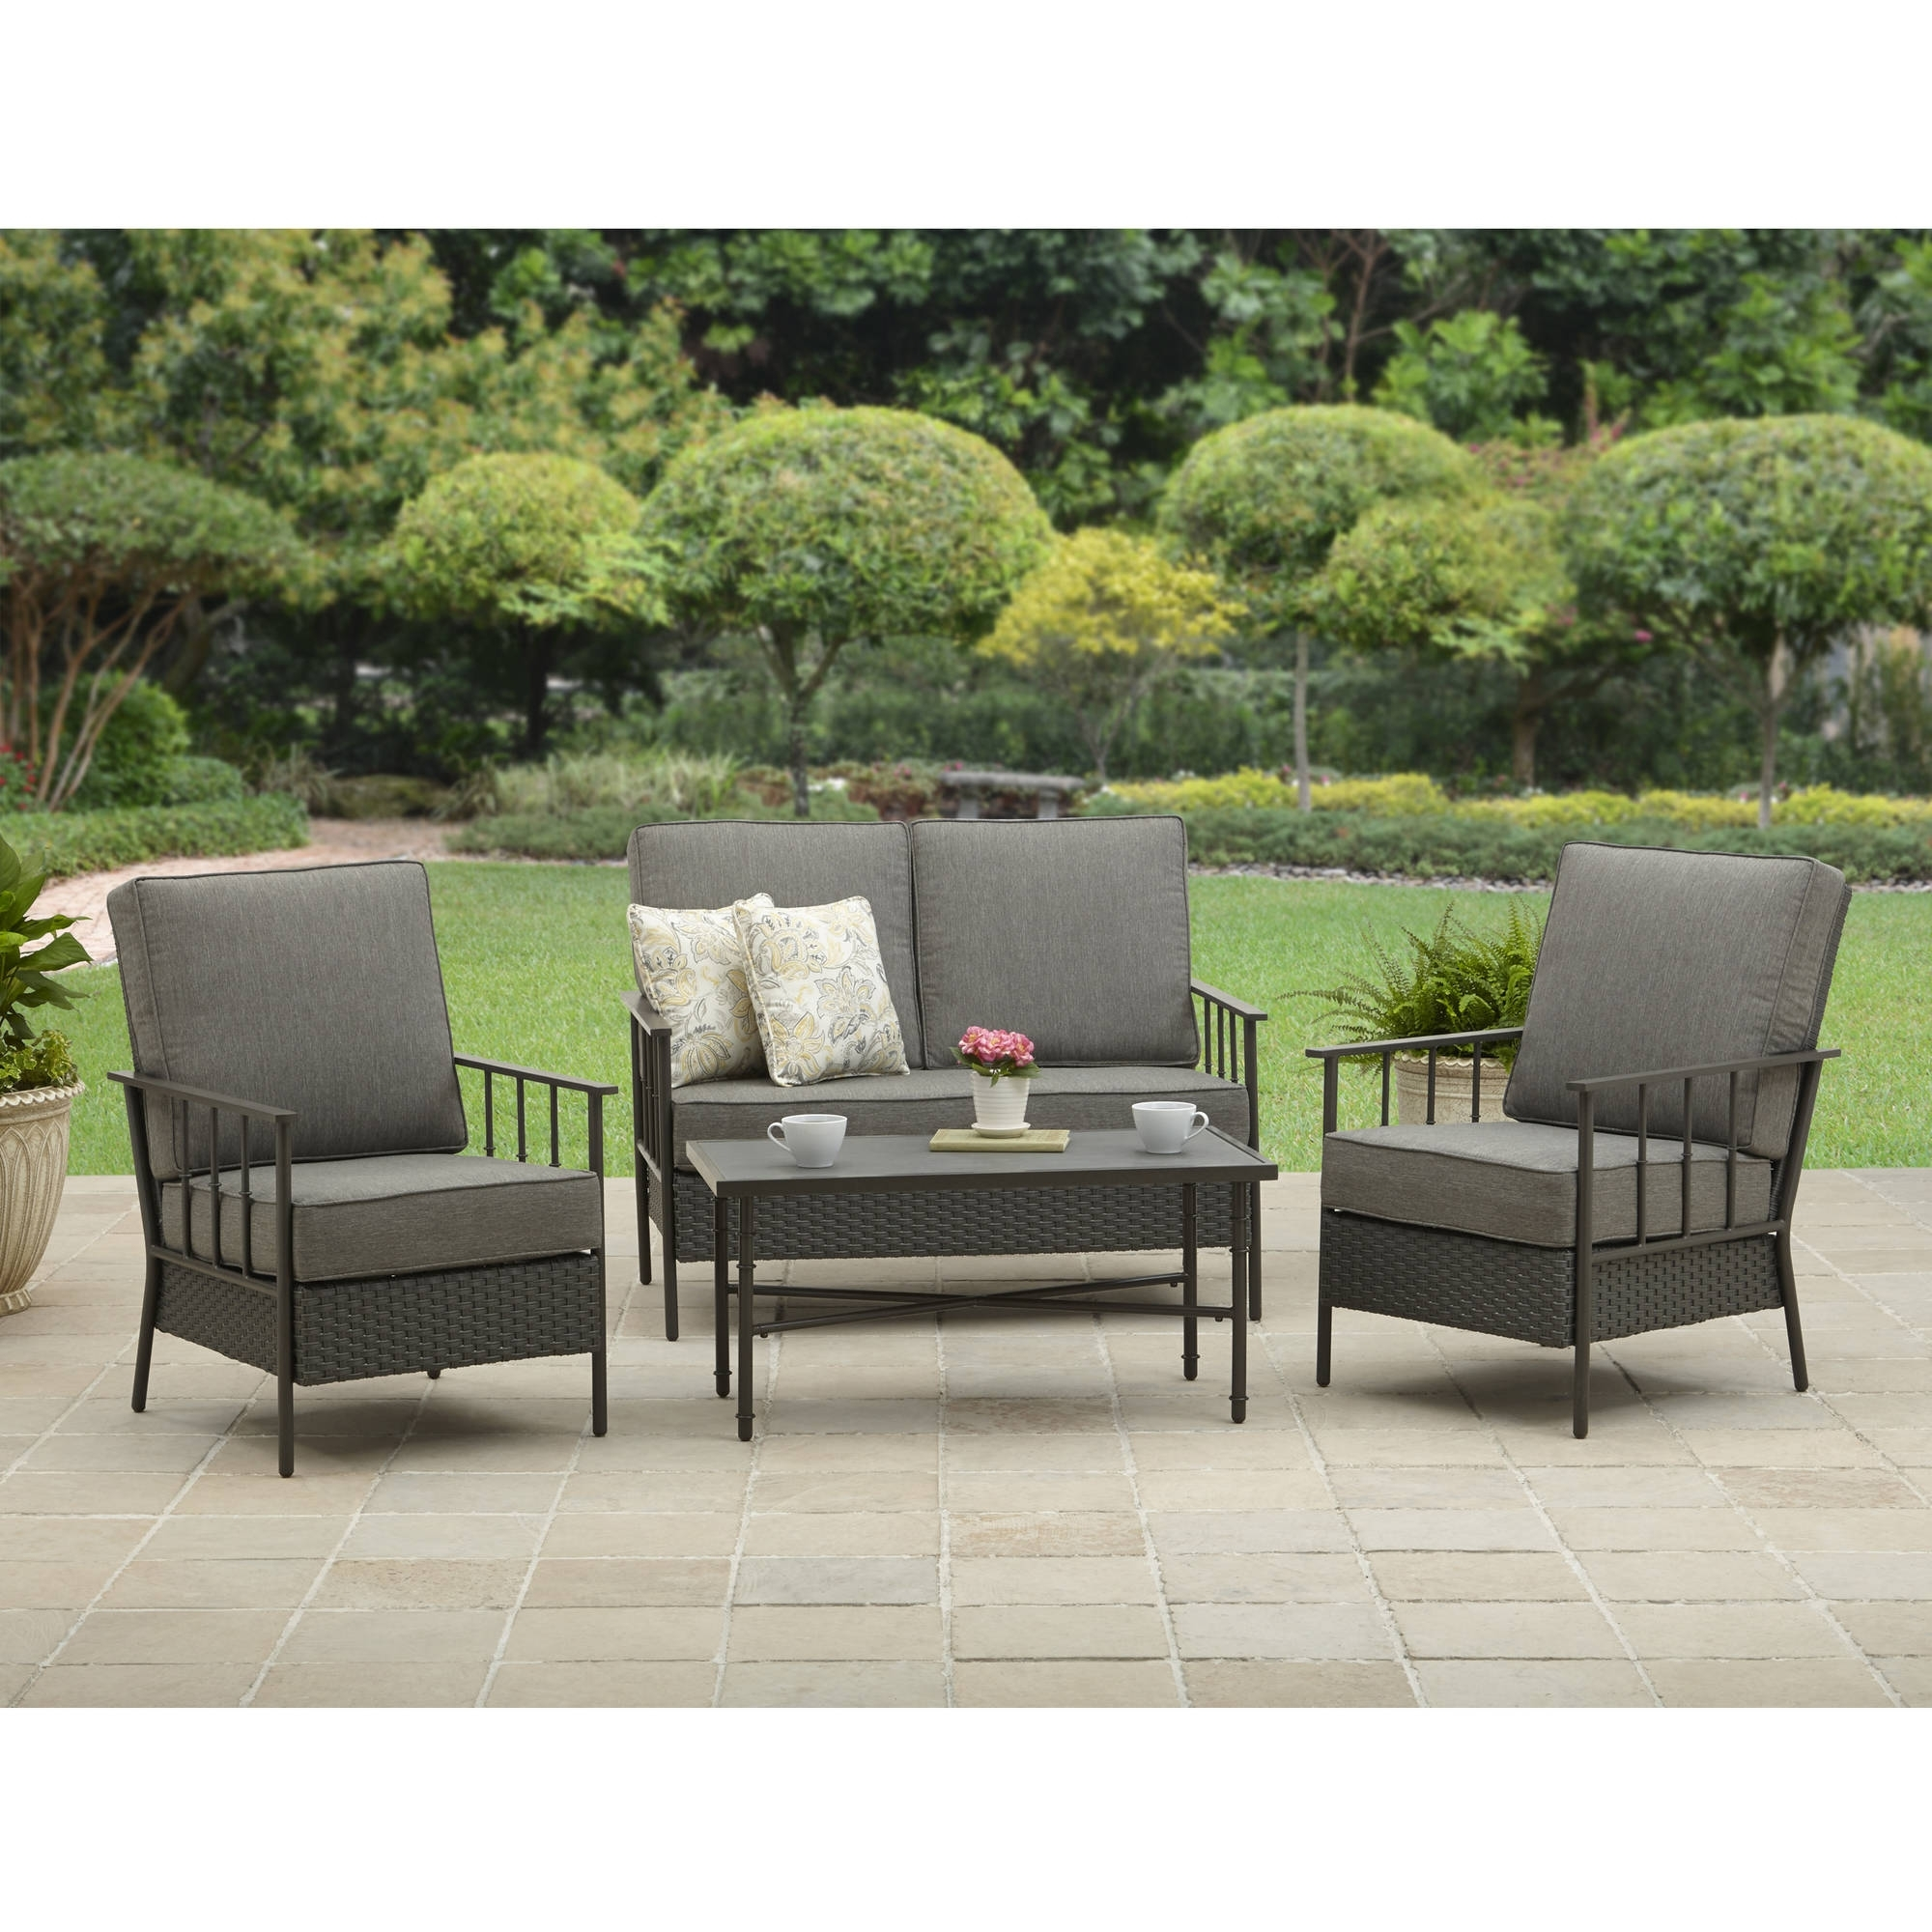 Most Current Better Homes And Garden Fairwater 4 Piece Outdoor Conversation Set Within Walmart Patio Furniture Conversation Sets (View 2 of 15)